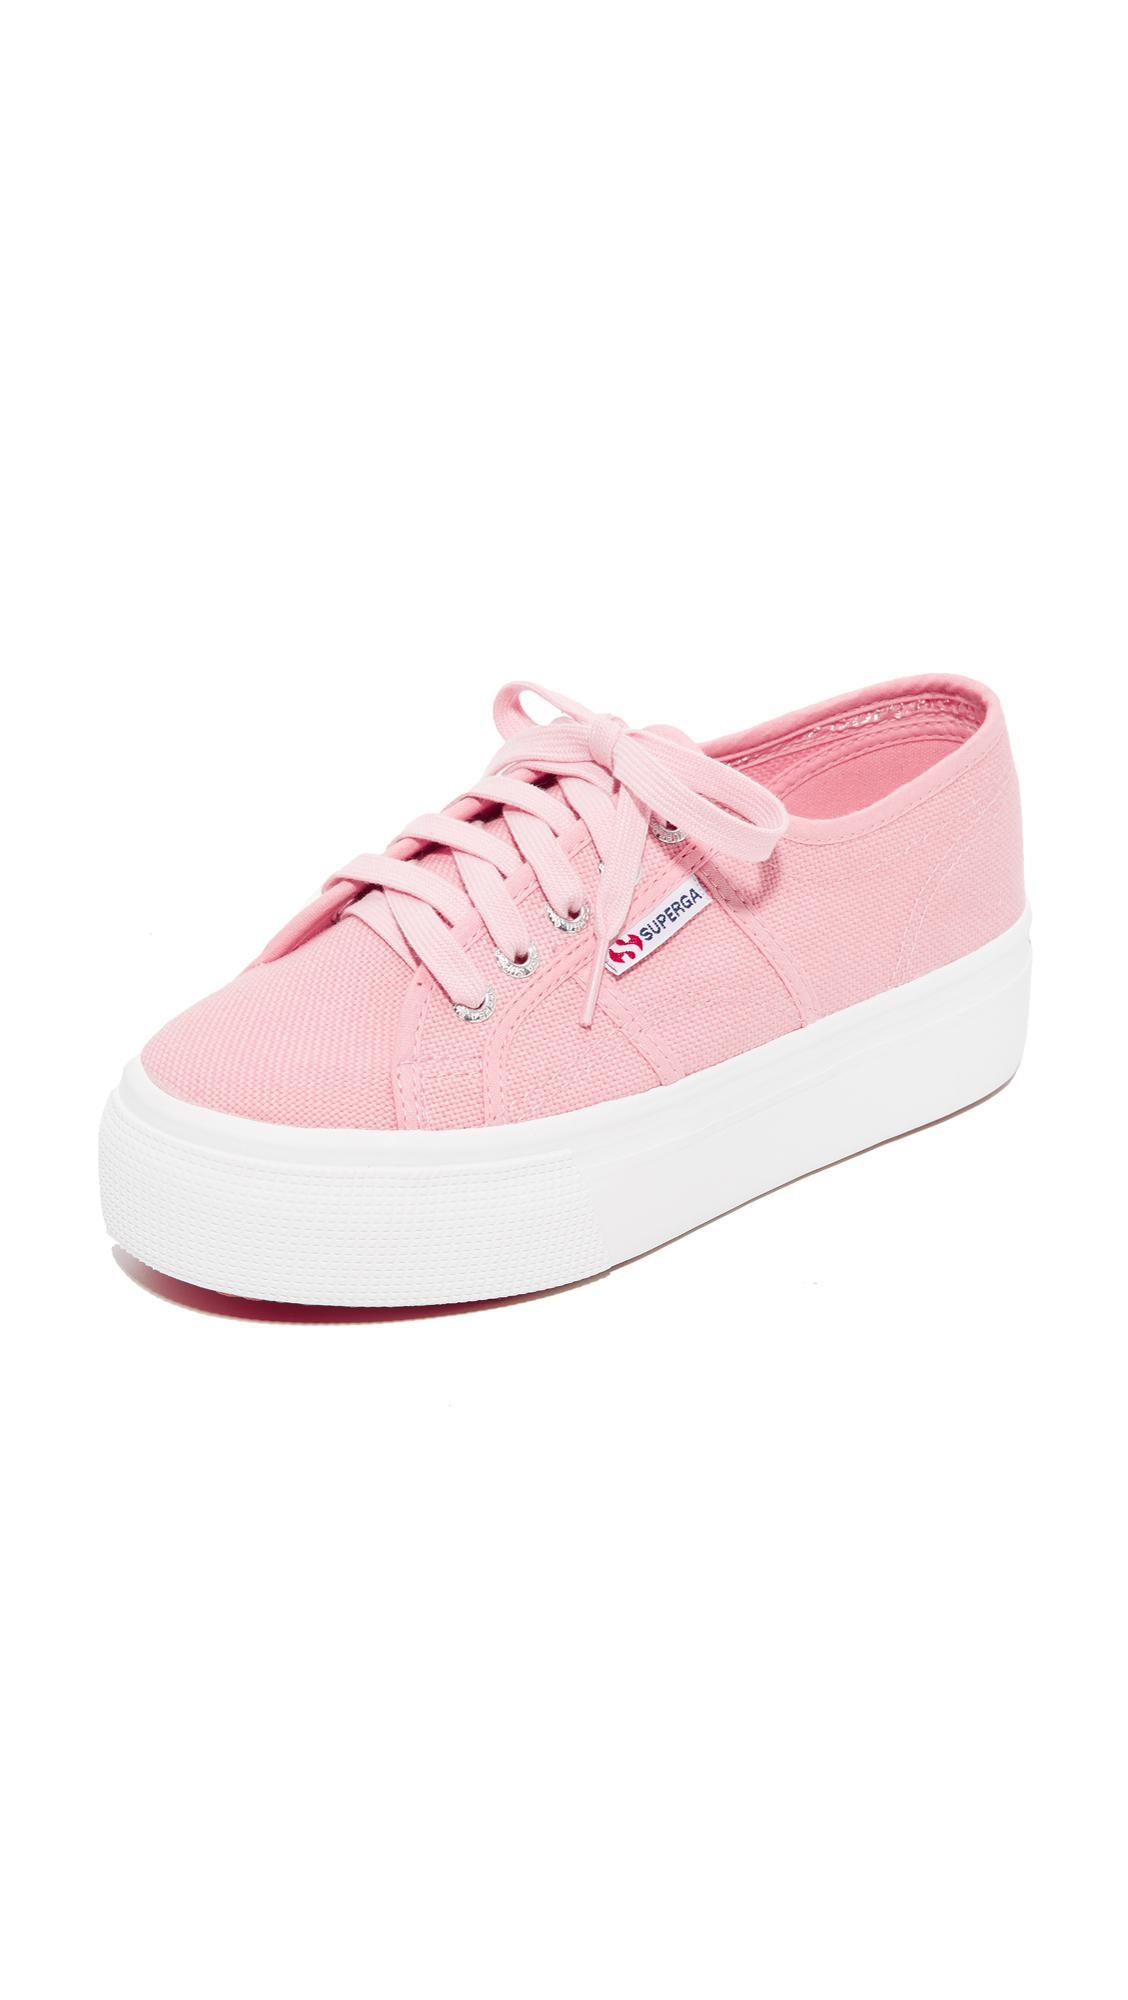 16967ae8eb6 Superga - Pink 2790 Platform Sneakers - Lyst. View fullscreen